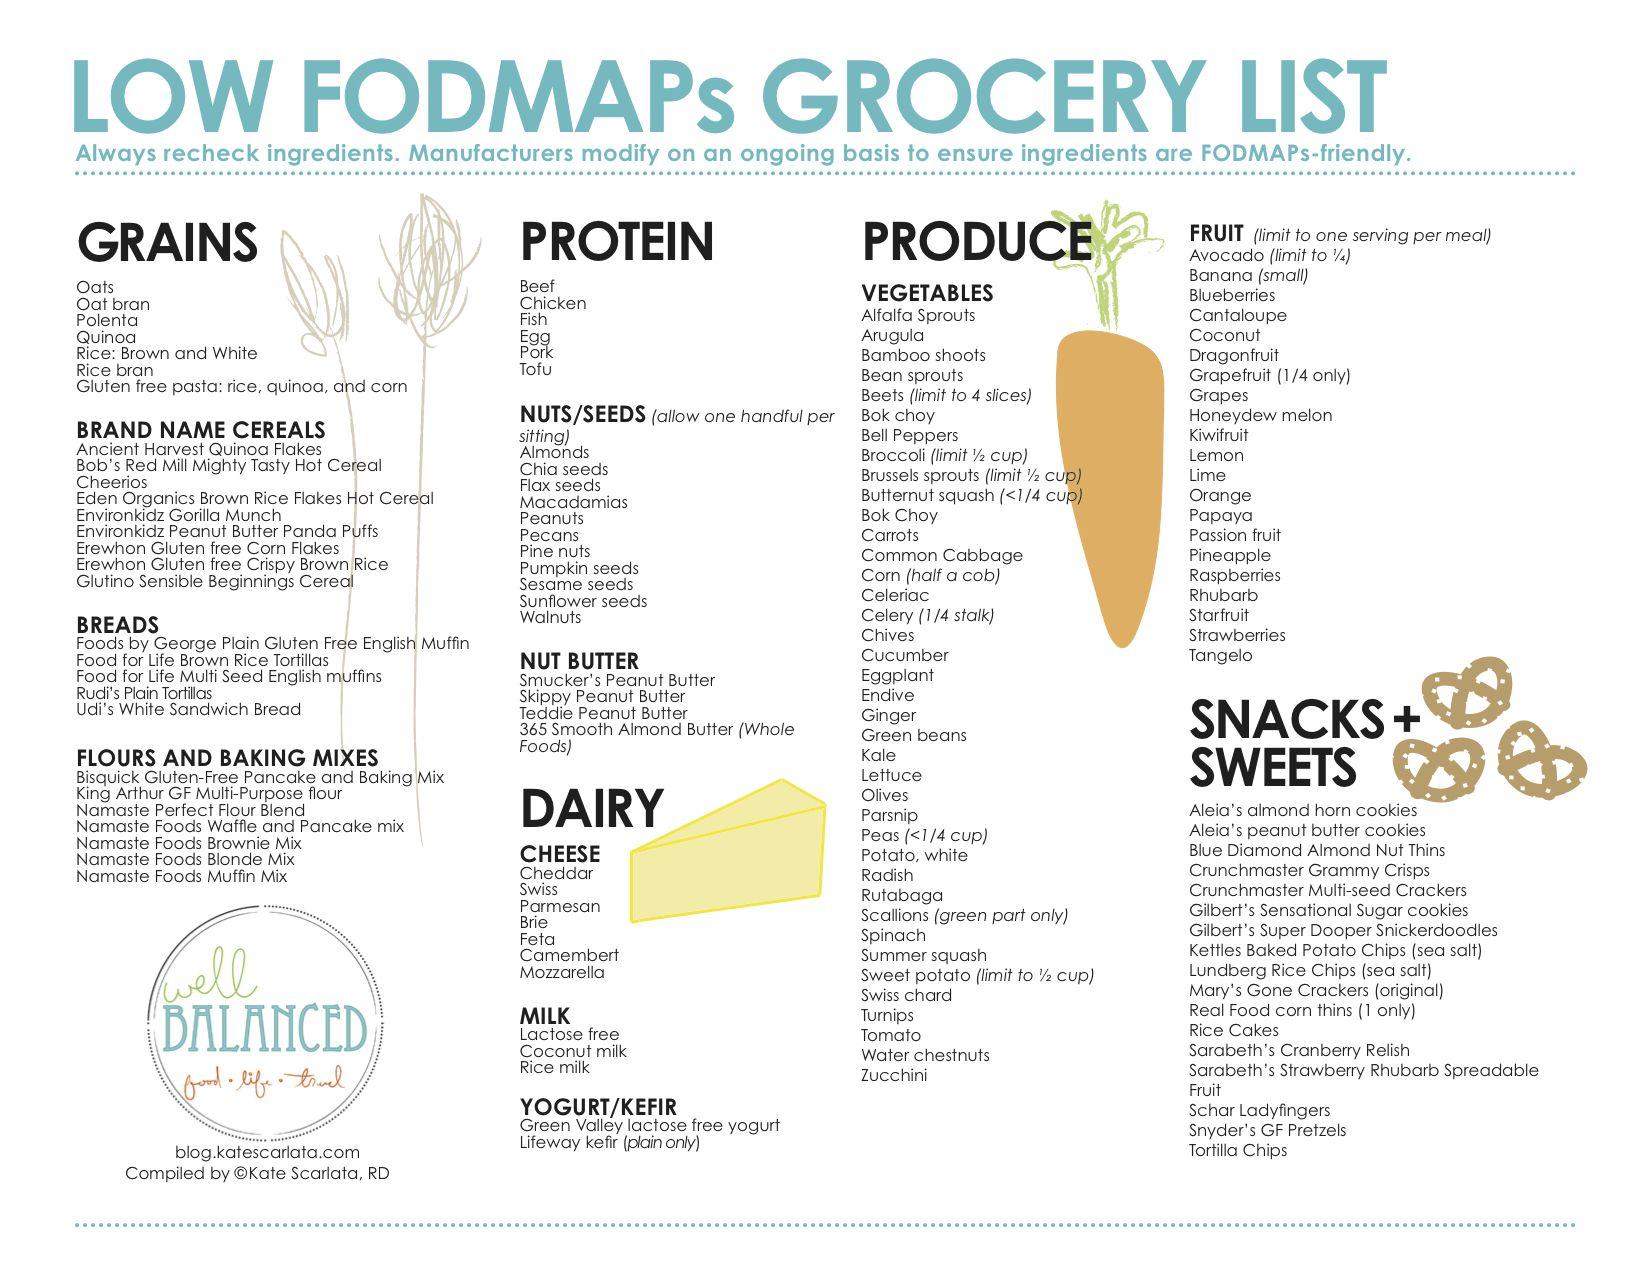 Low Fodmap Grocery List Fodmap Diet Recipes Low Fodmap Diet Recipes Fodmap